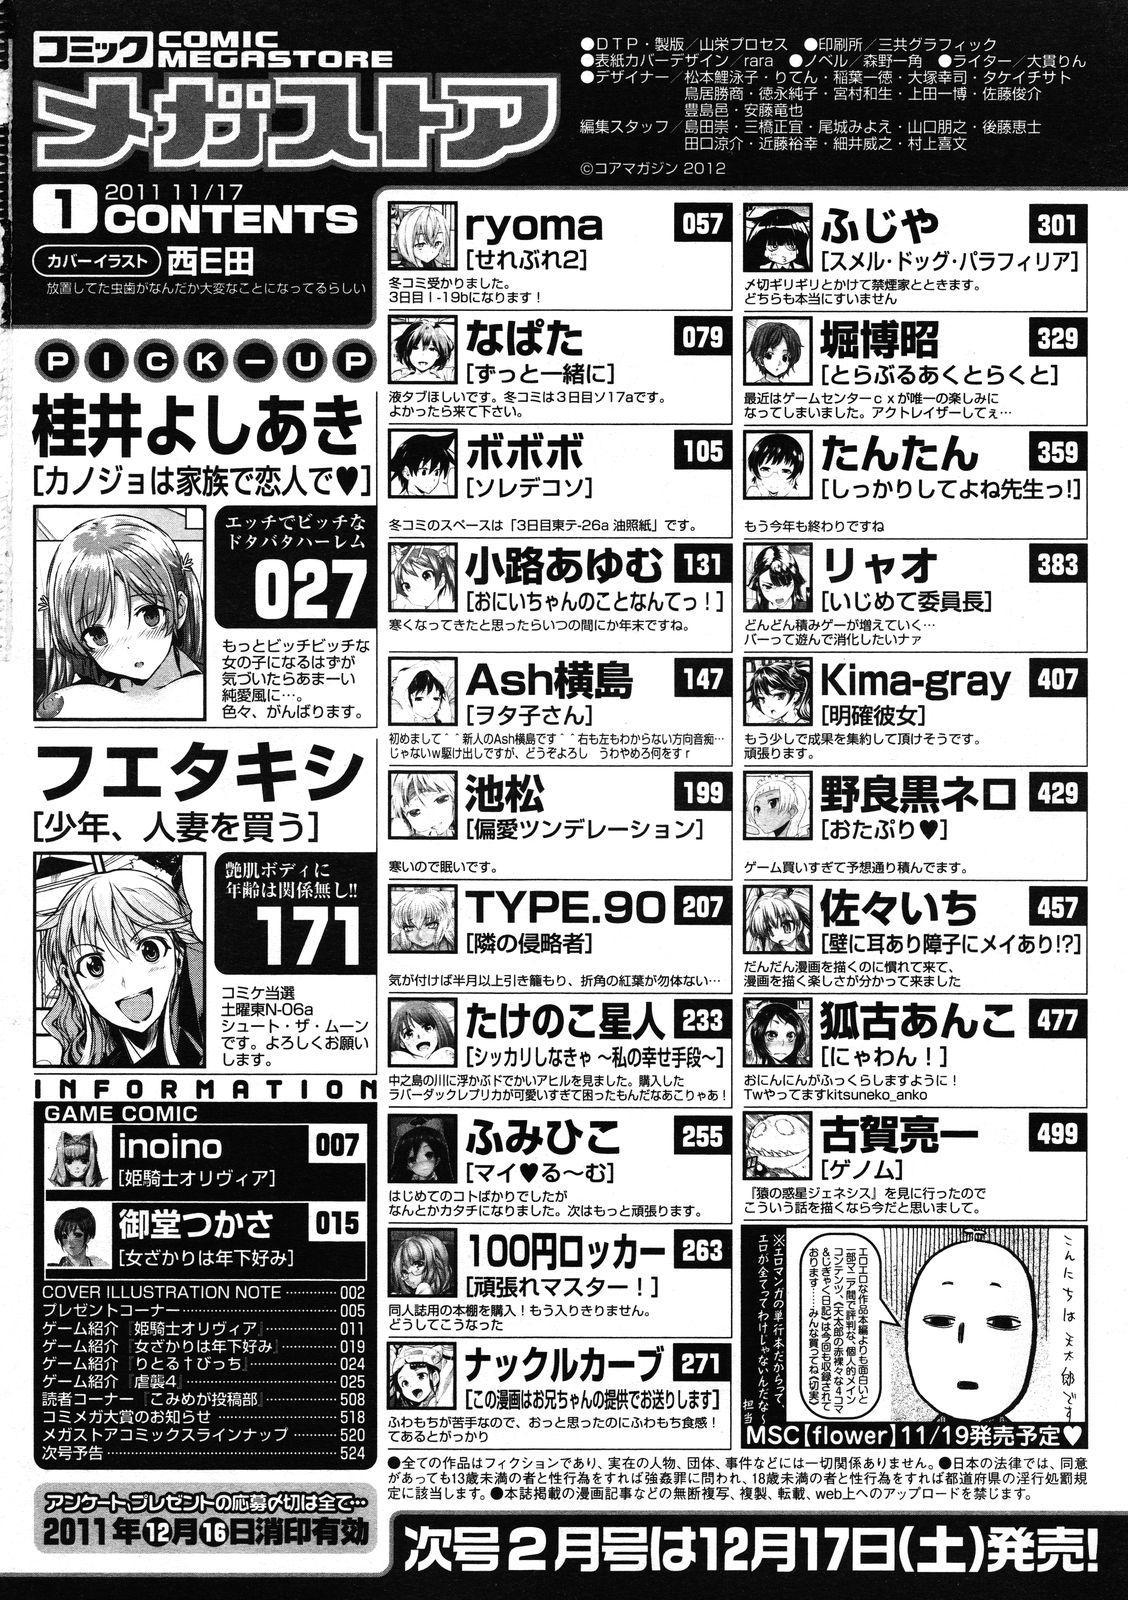 COMIC Megastore 2012-01 521